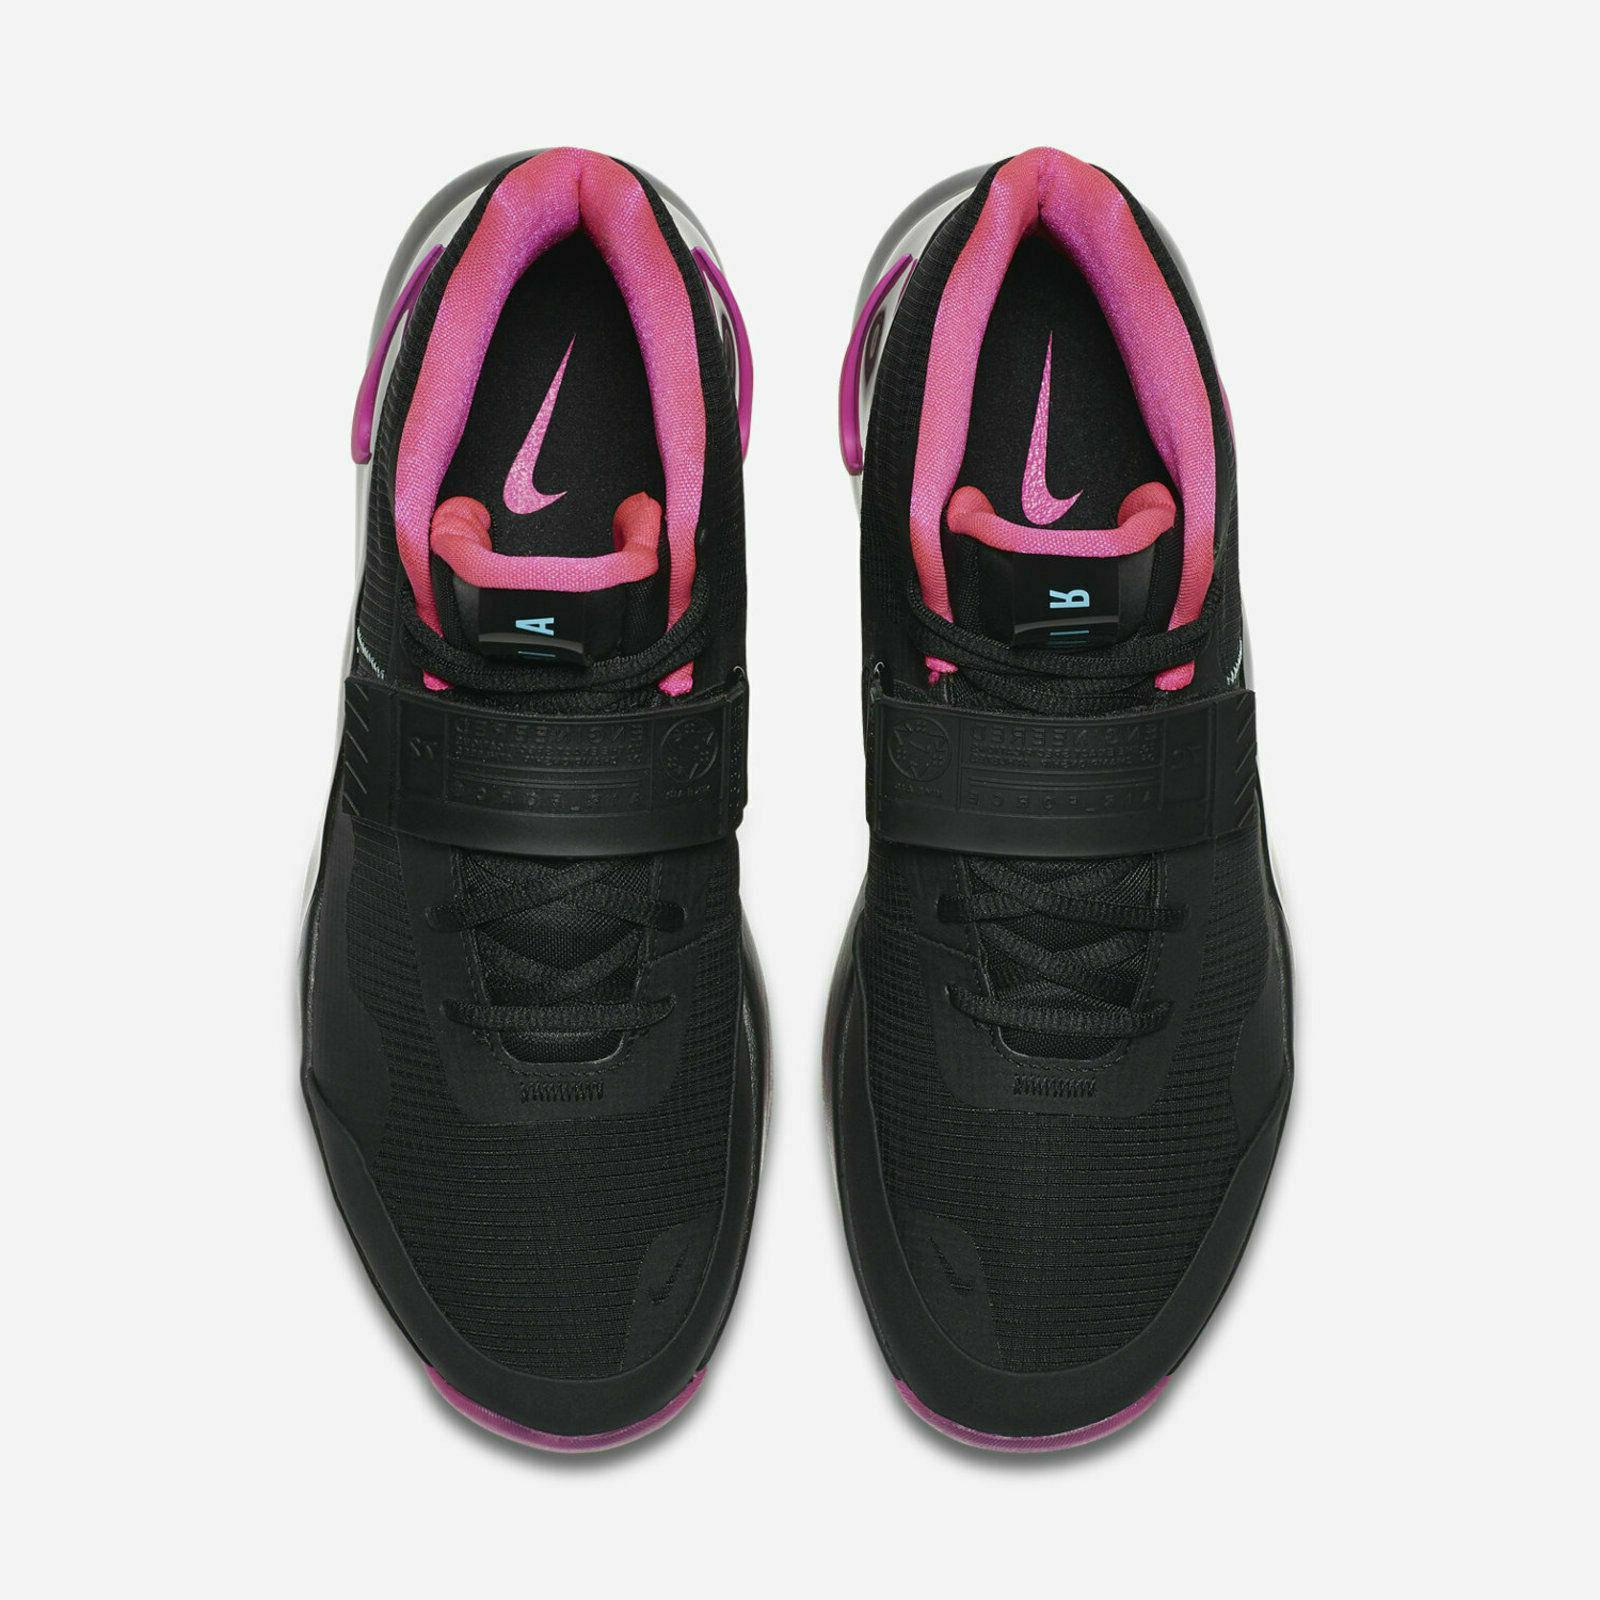 Nike Max AR0974-004 Black Men's Basketball Shoes